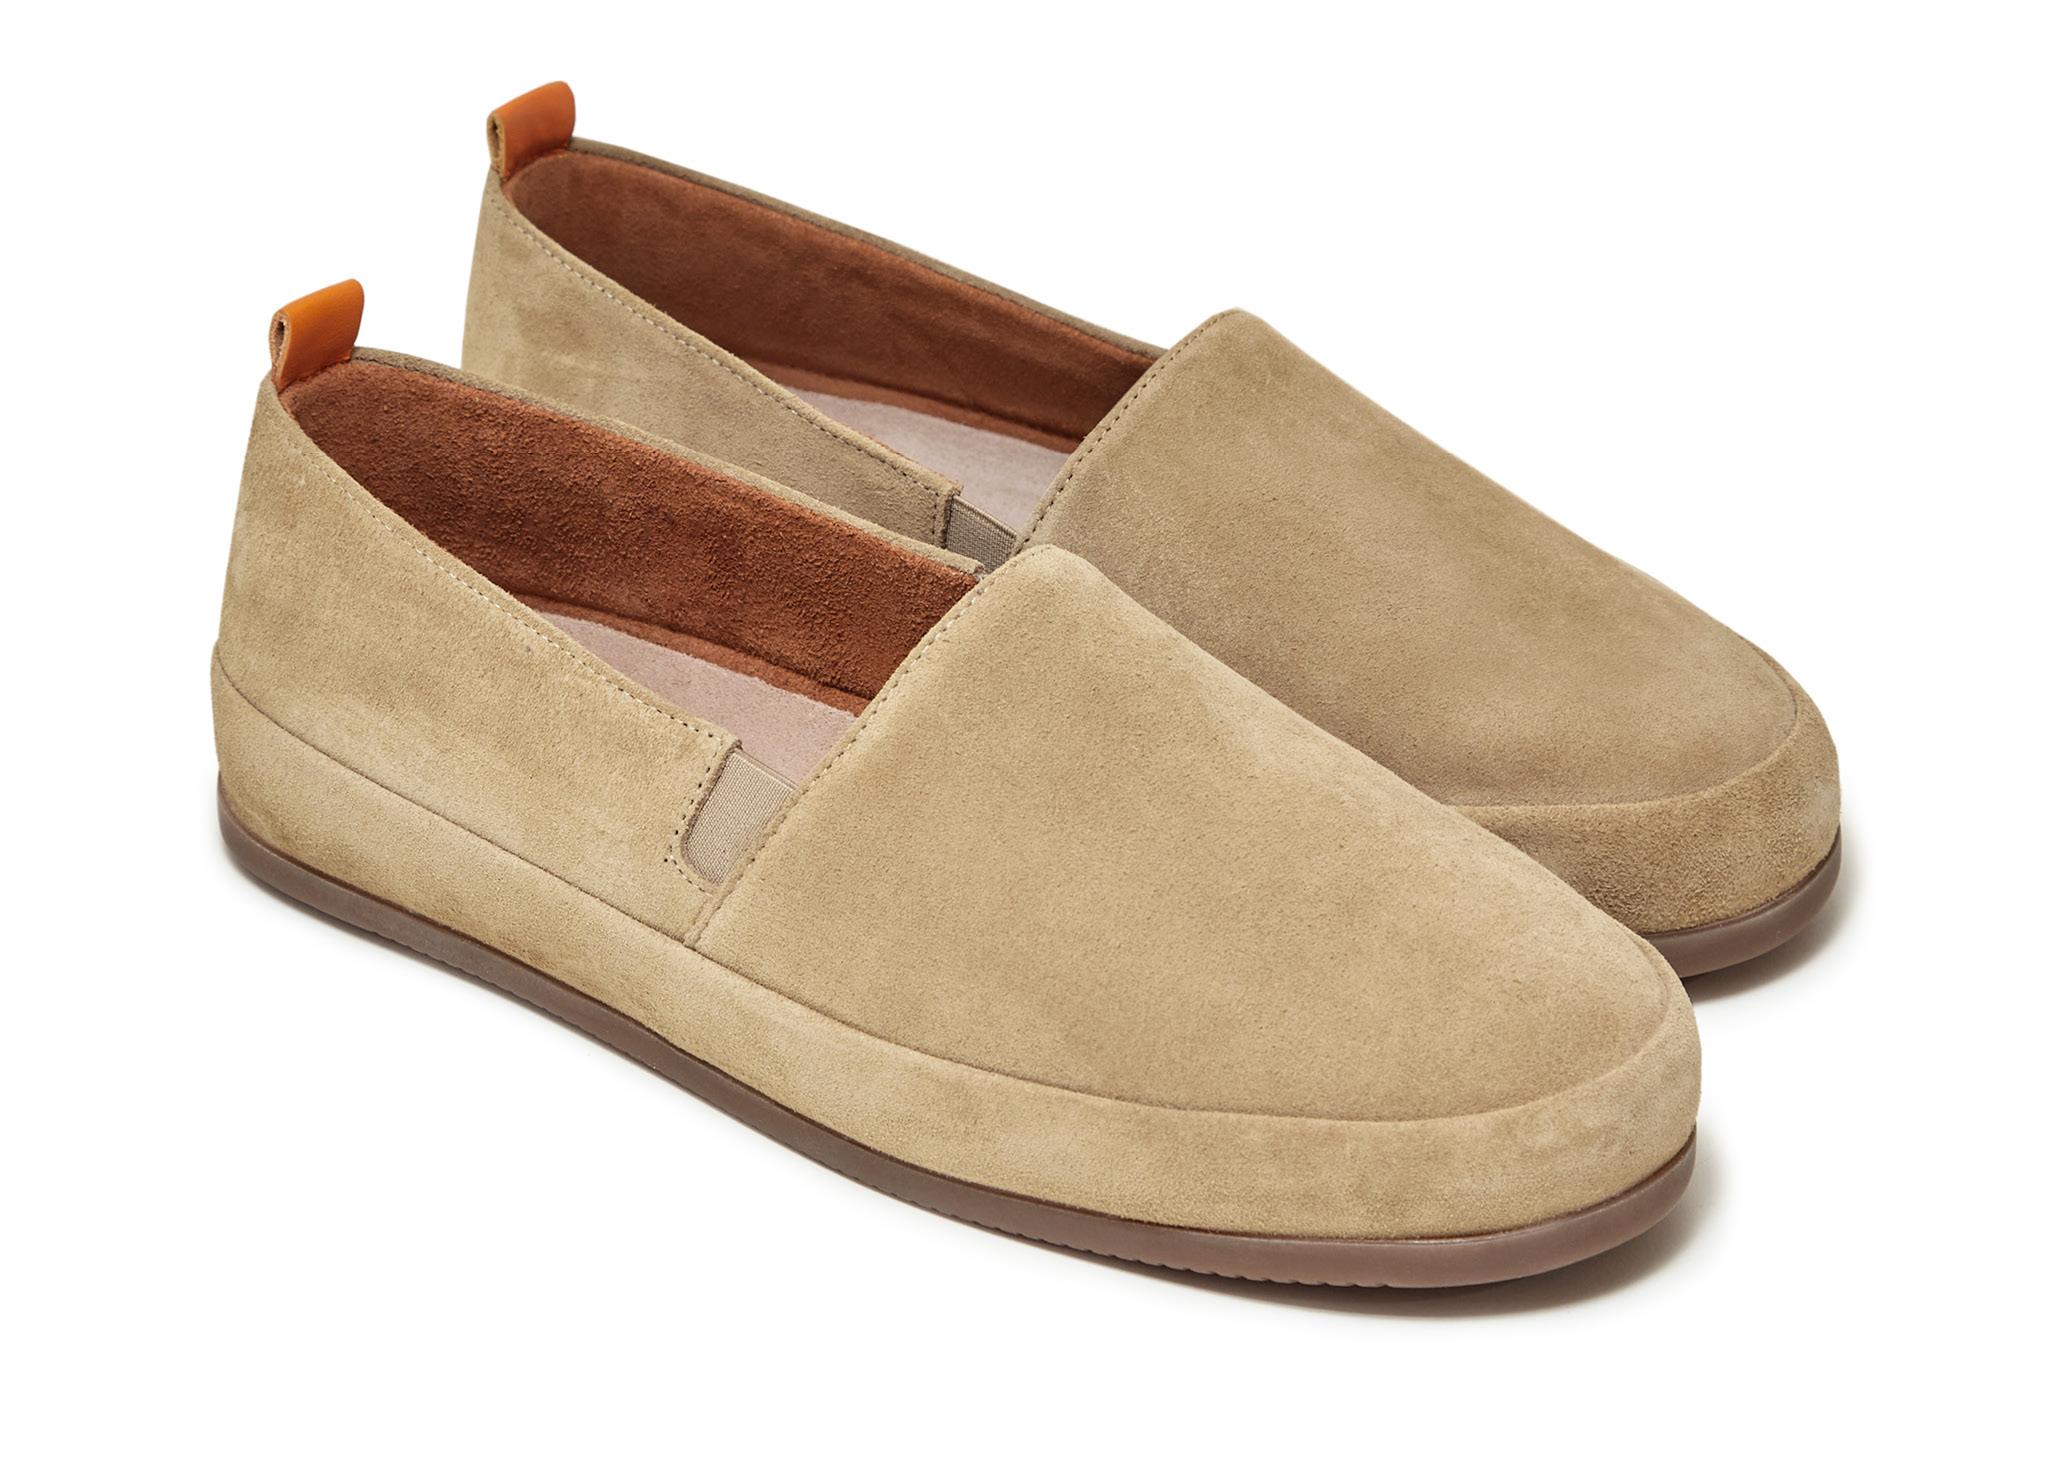 Mens Tan Loafers | MULO shoes | Premium